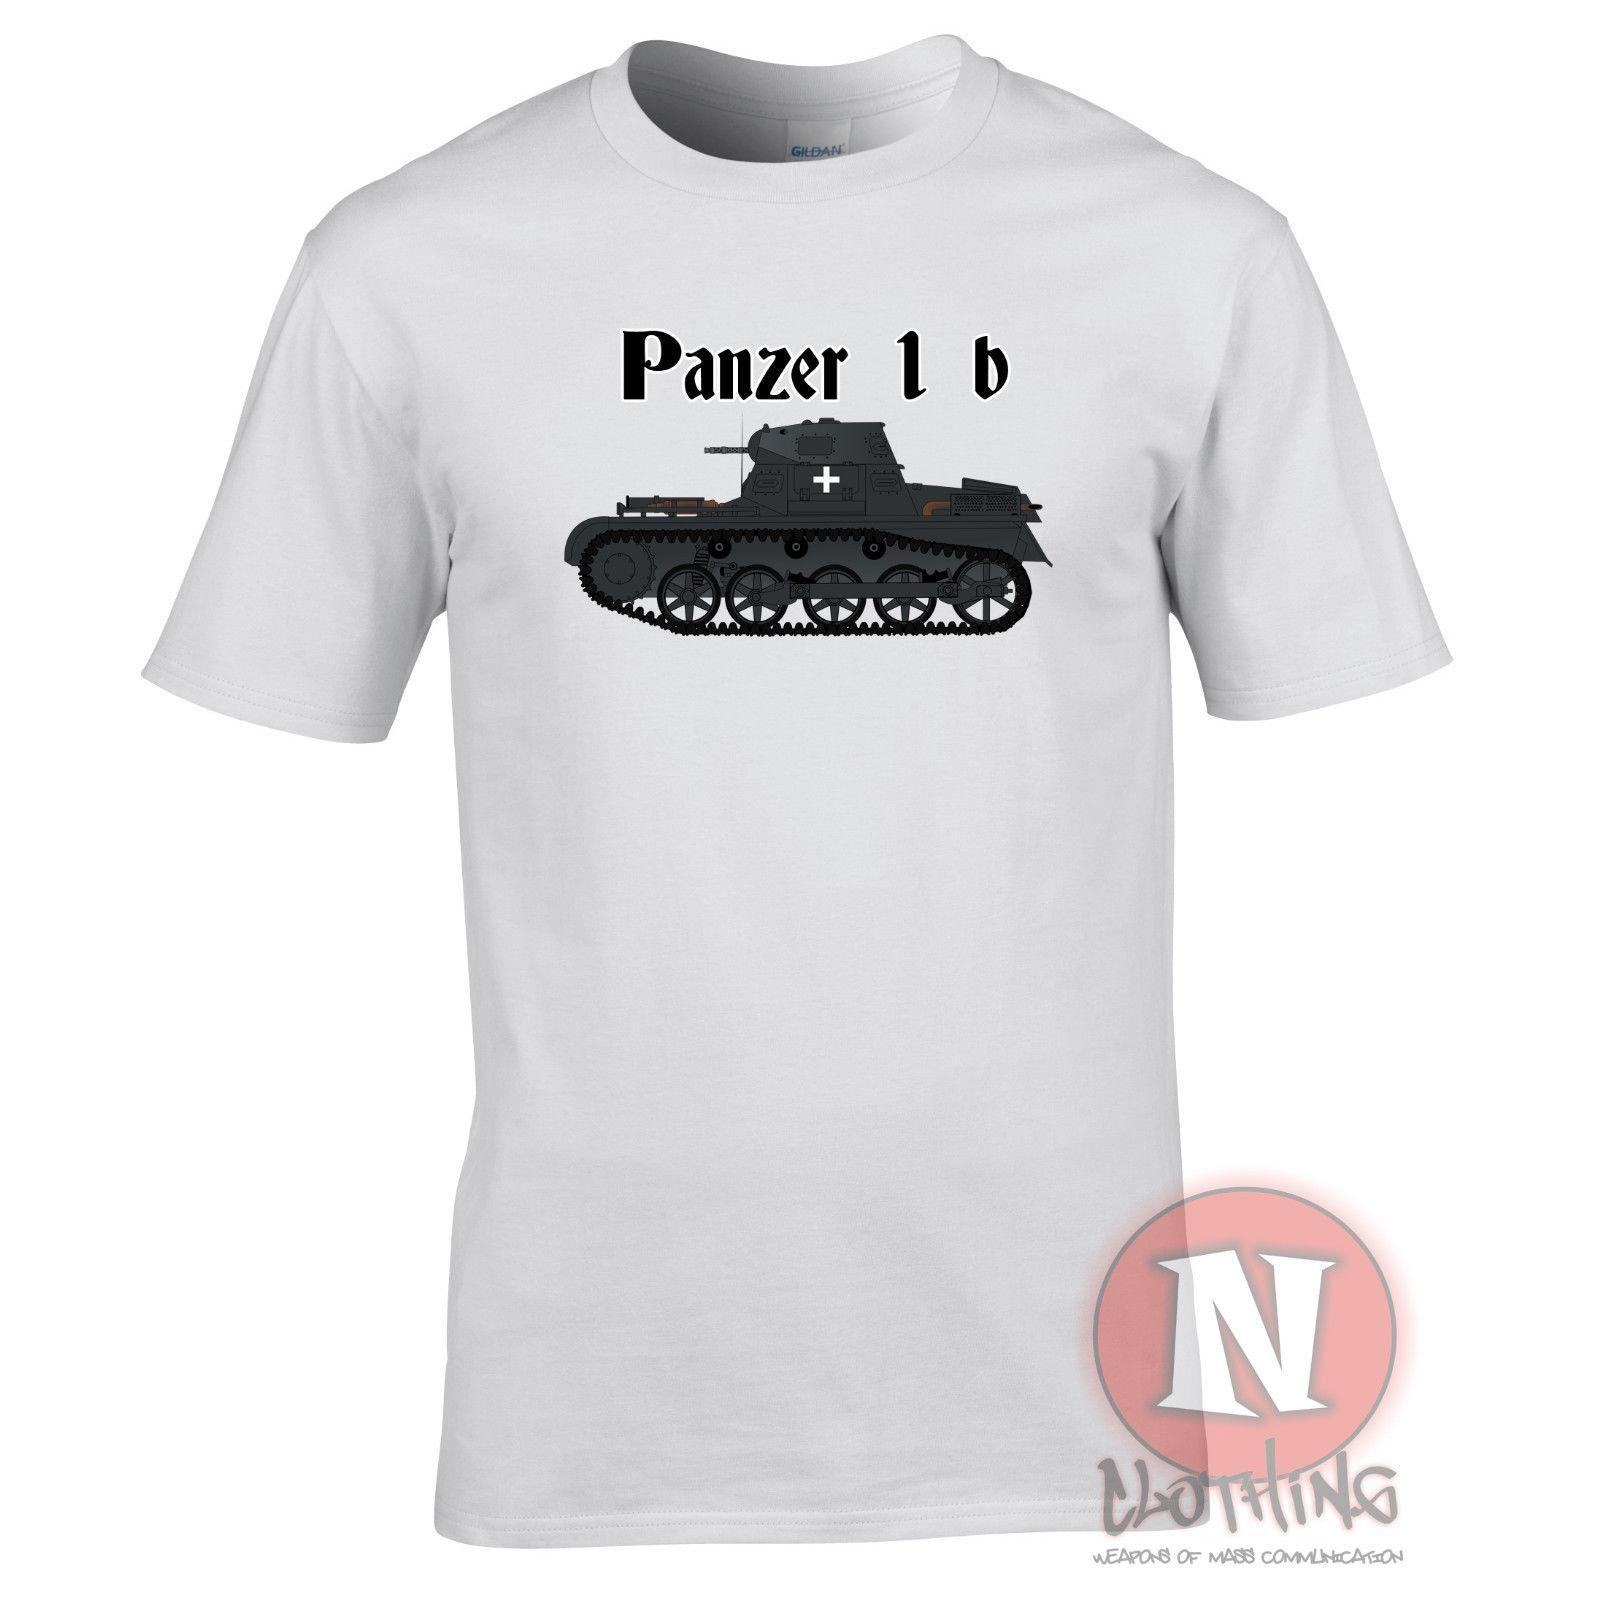 Panzer 1 B tank WW2 German military artillery armour T-shirt World of war  Tanks